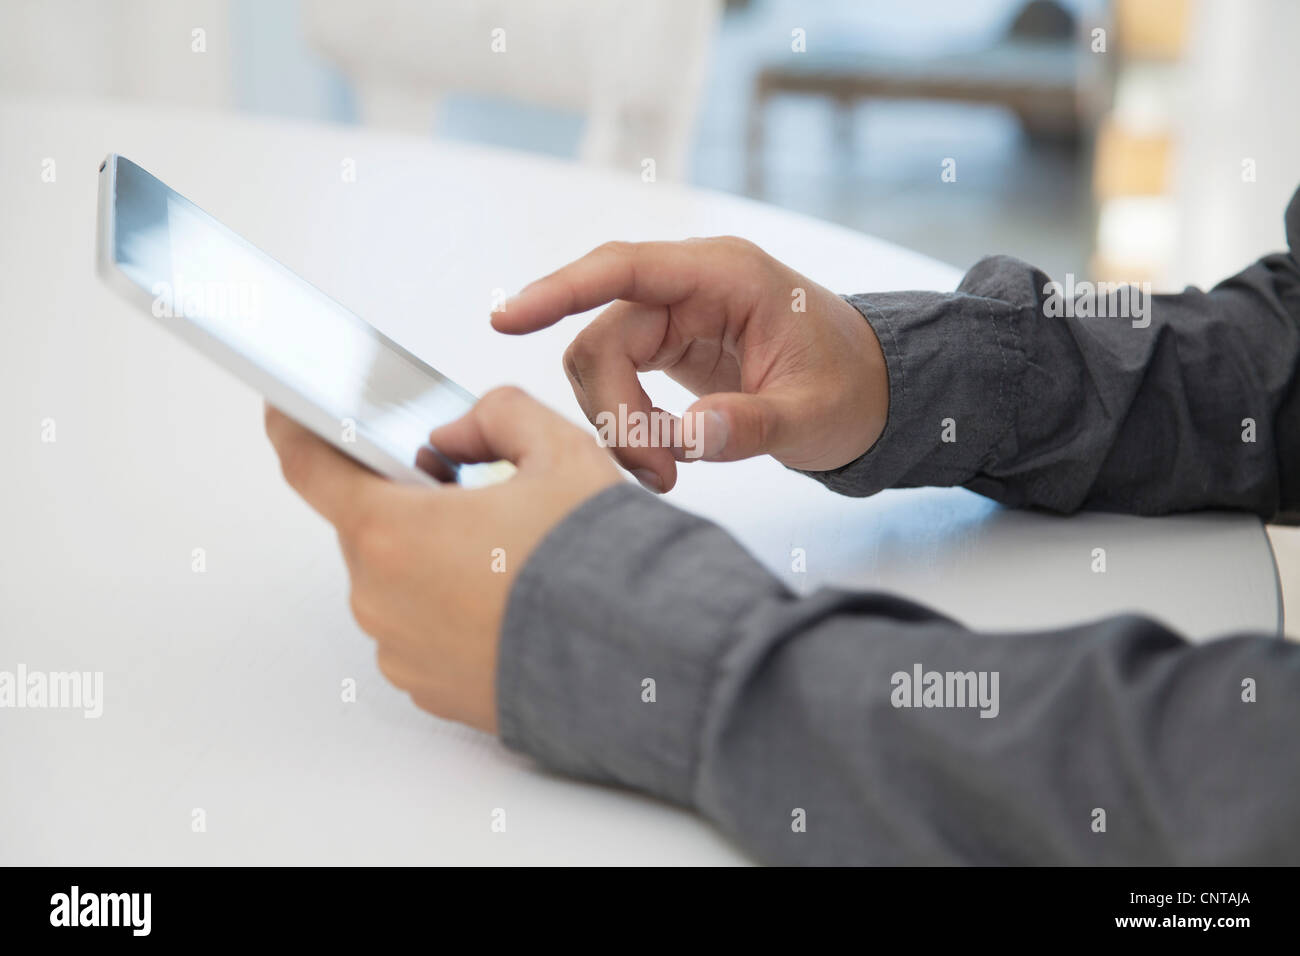 Mann mit digital-Tablette, beschnitten Stockbild